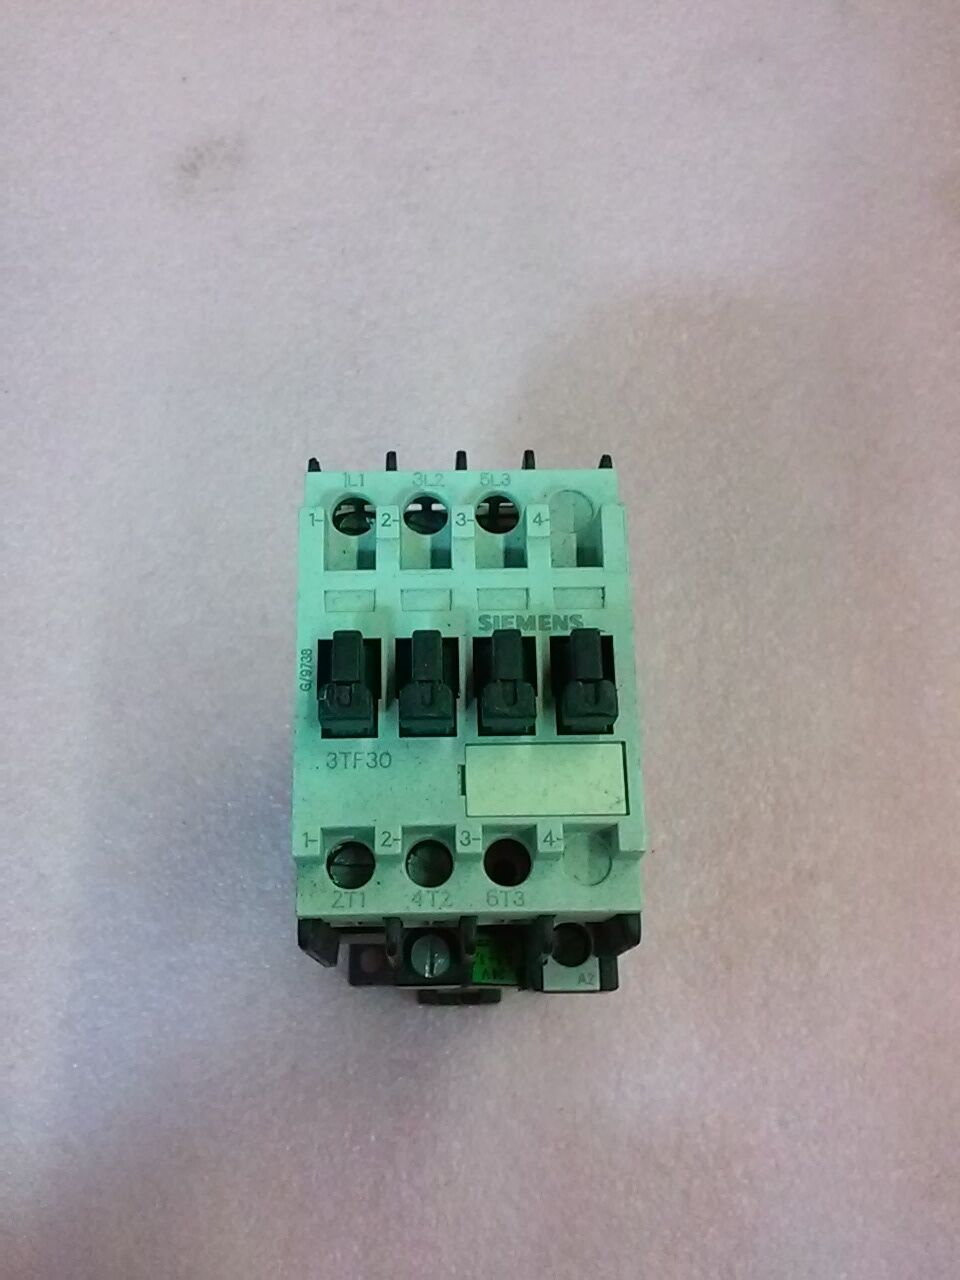 SIEMENS 3TF30 MOTOR STARTER CONTACTOR 3TF3000-0B 24VDC COIL 20A 600VAC